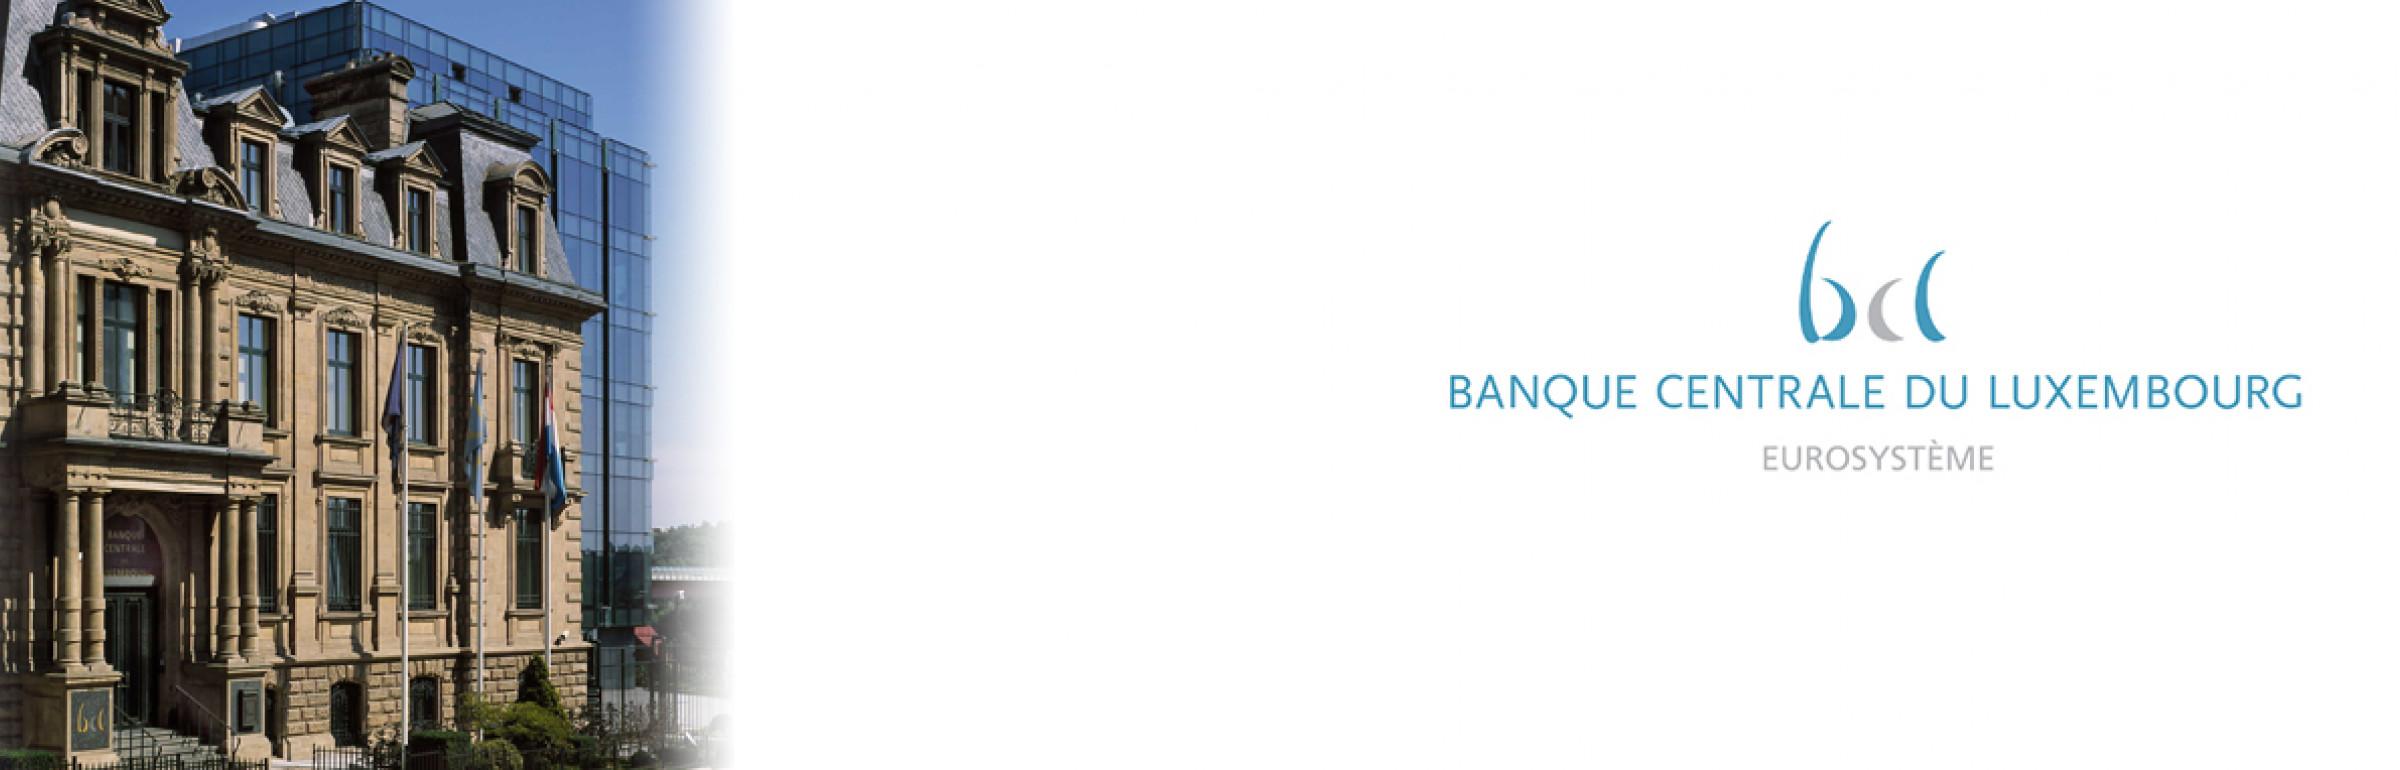 Banner Banque Centrale du Luxembourg